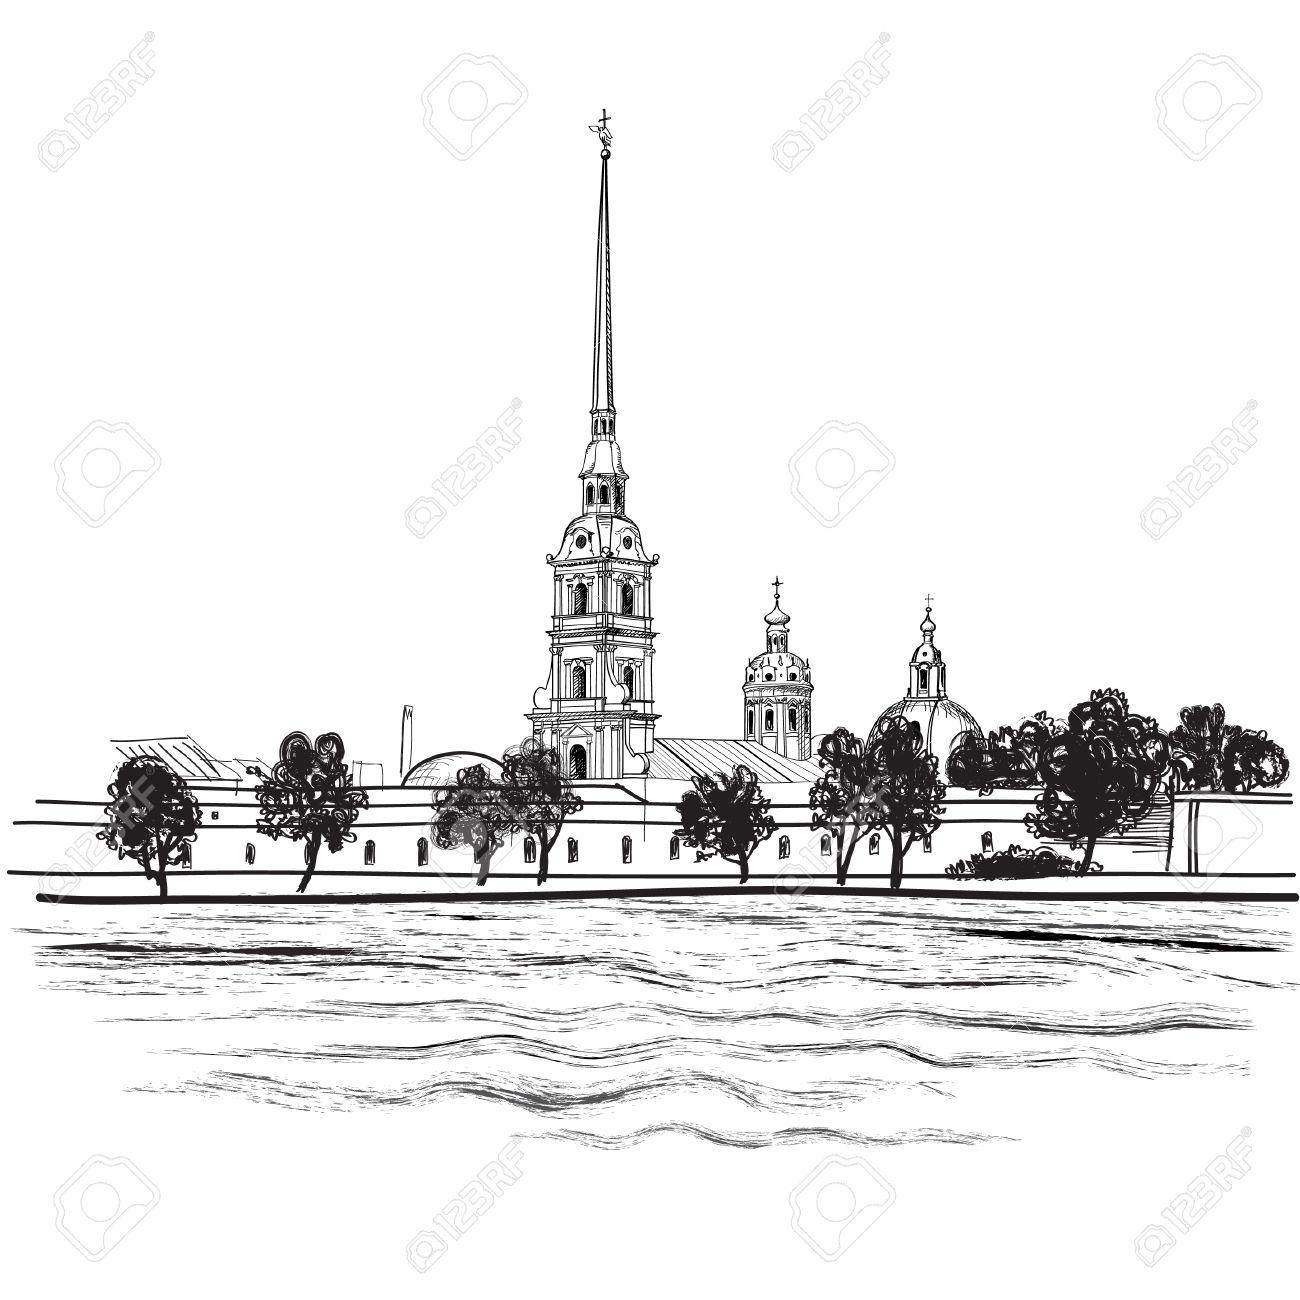 Saint Petersburg clipart #18, Download drawings